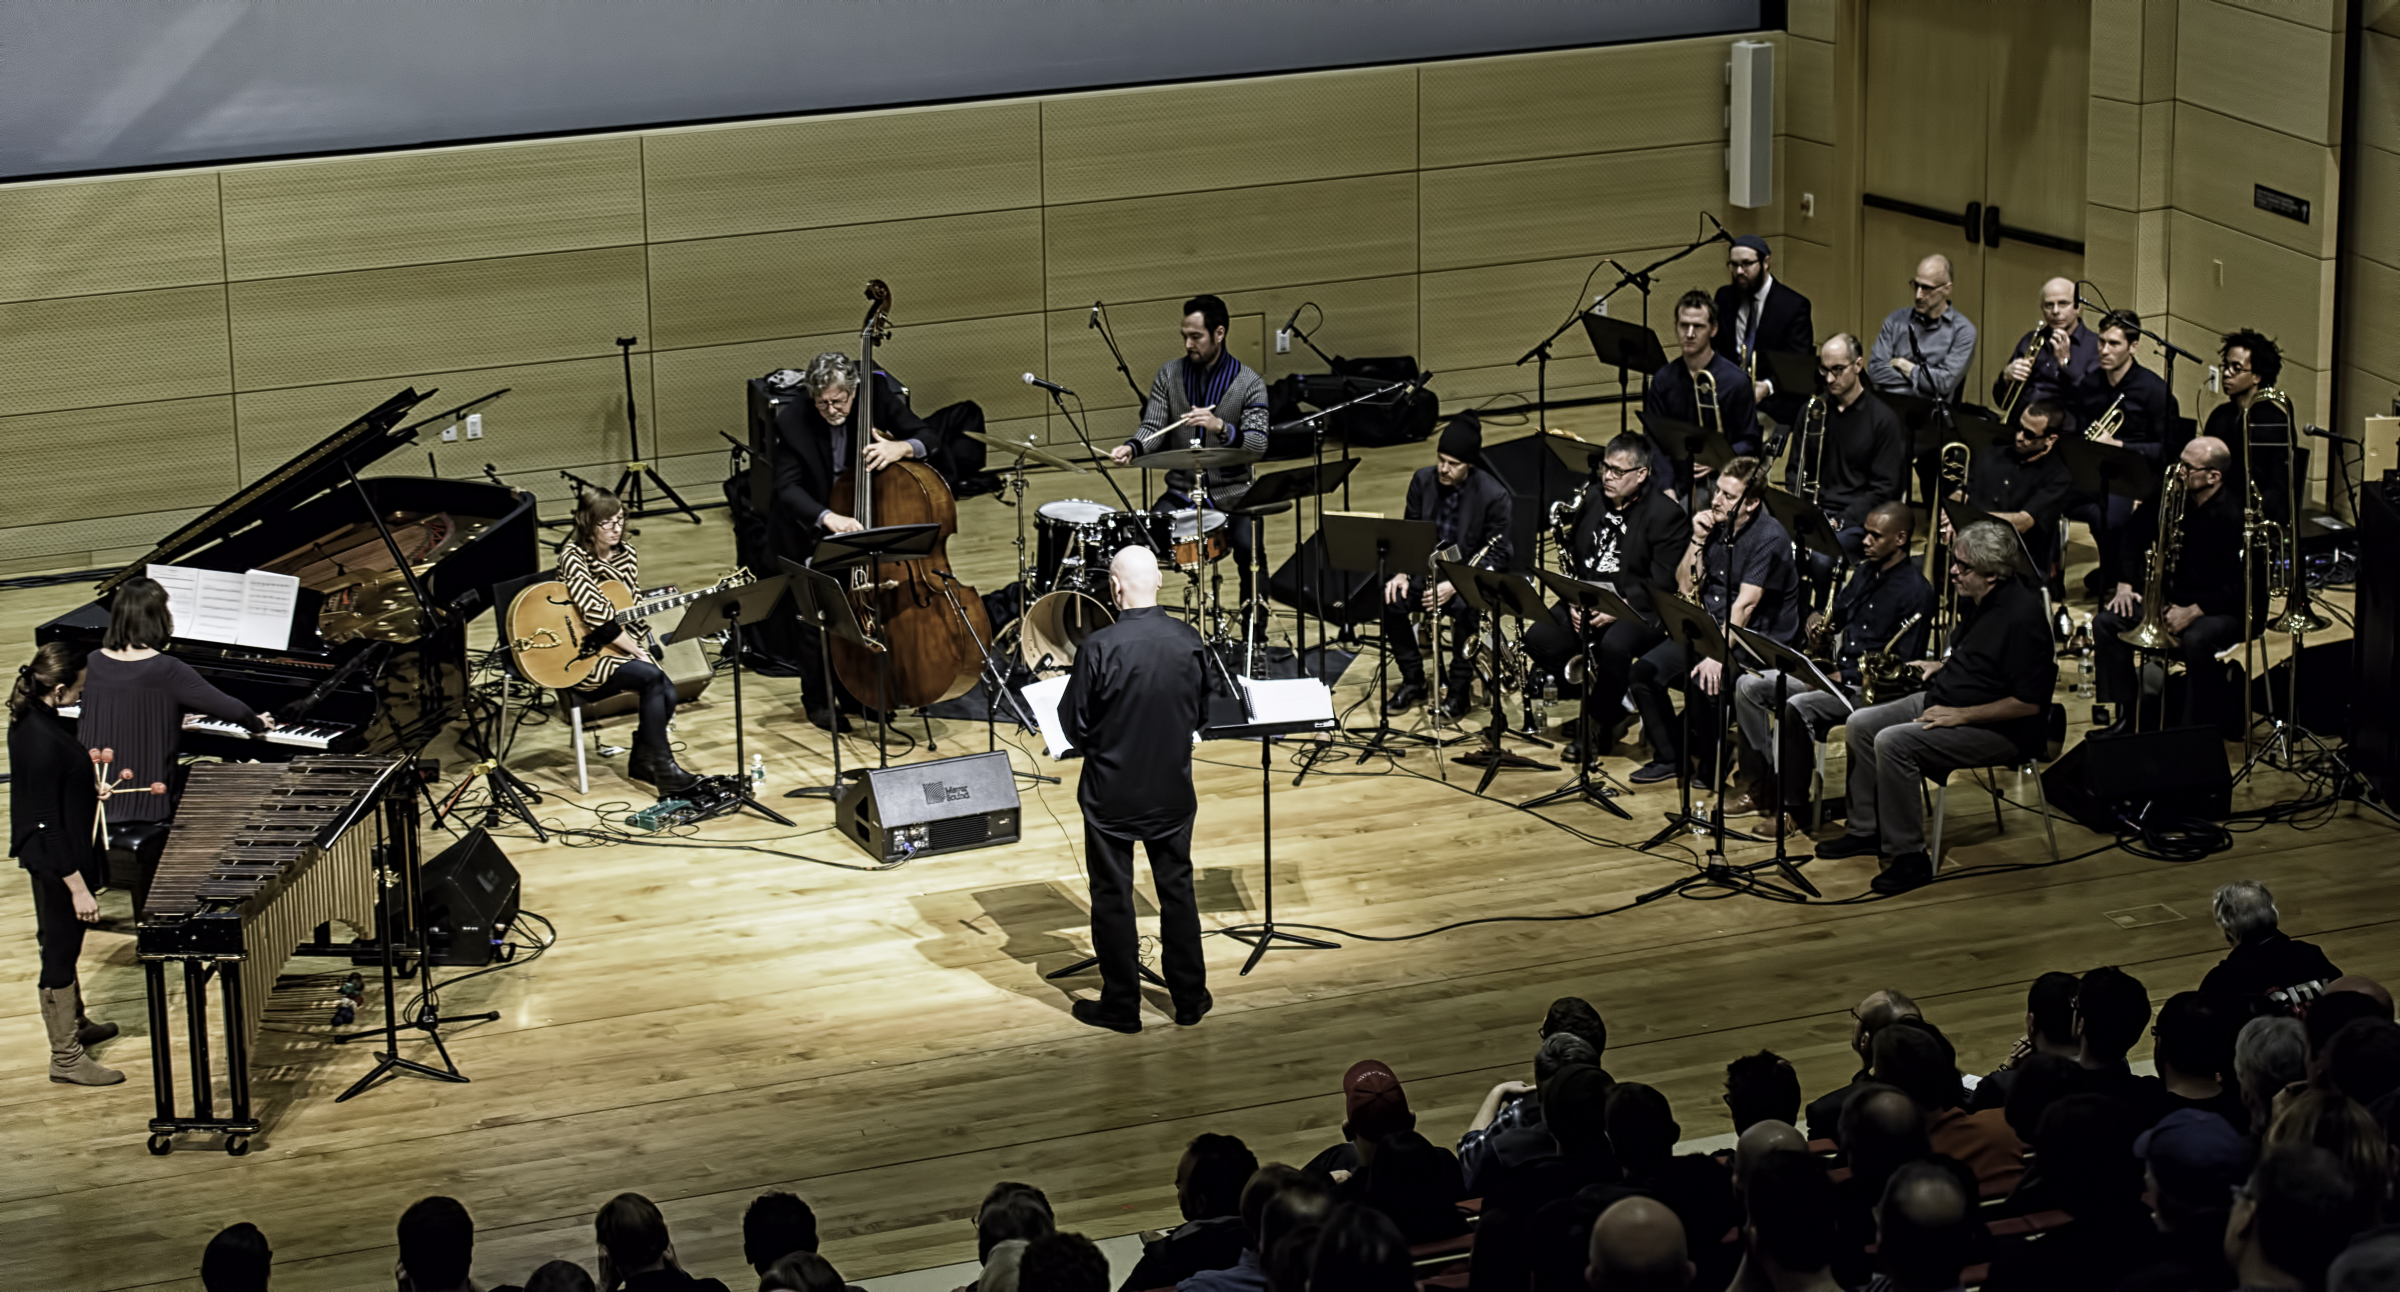 Mark Helias Conducting Michael Formanek's Ensemble Kolossus At The Nyc Winter Jazzfest 2016